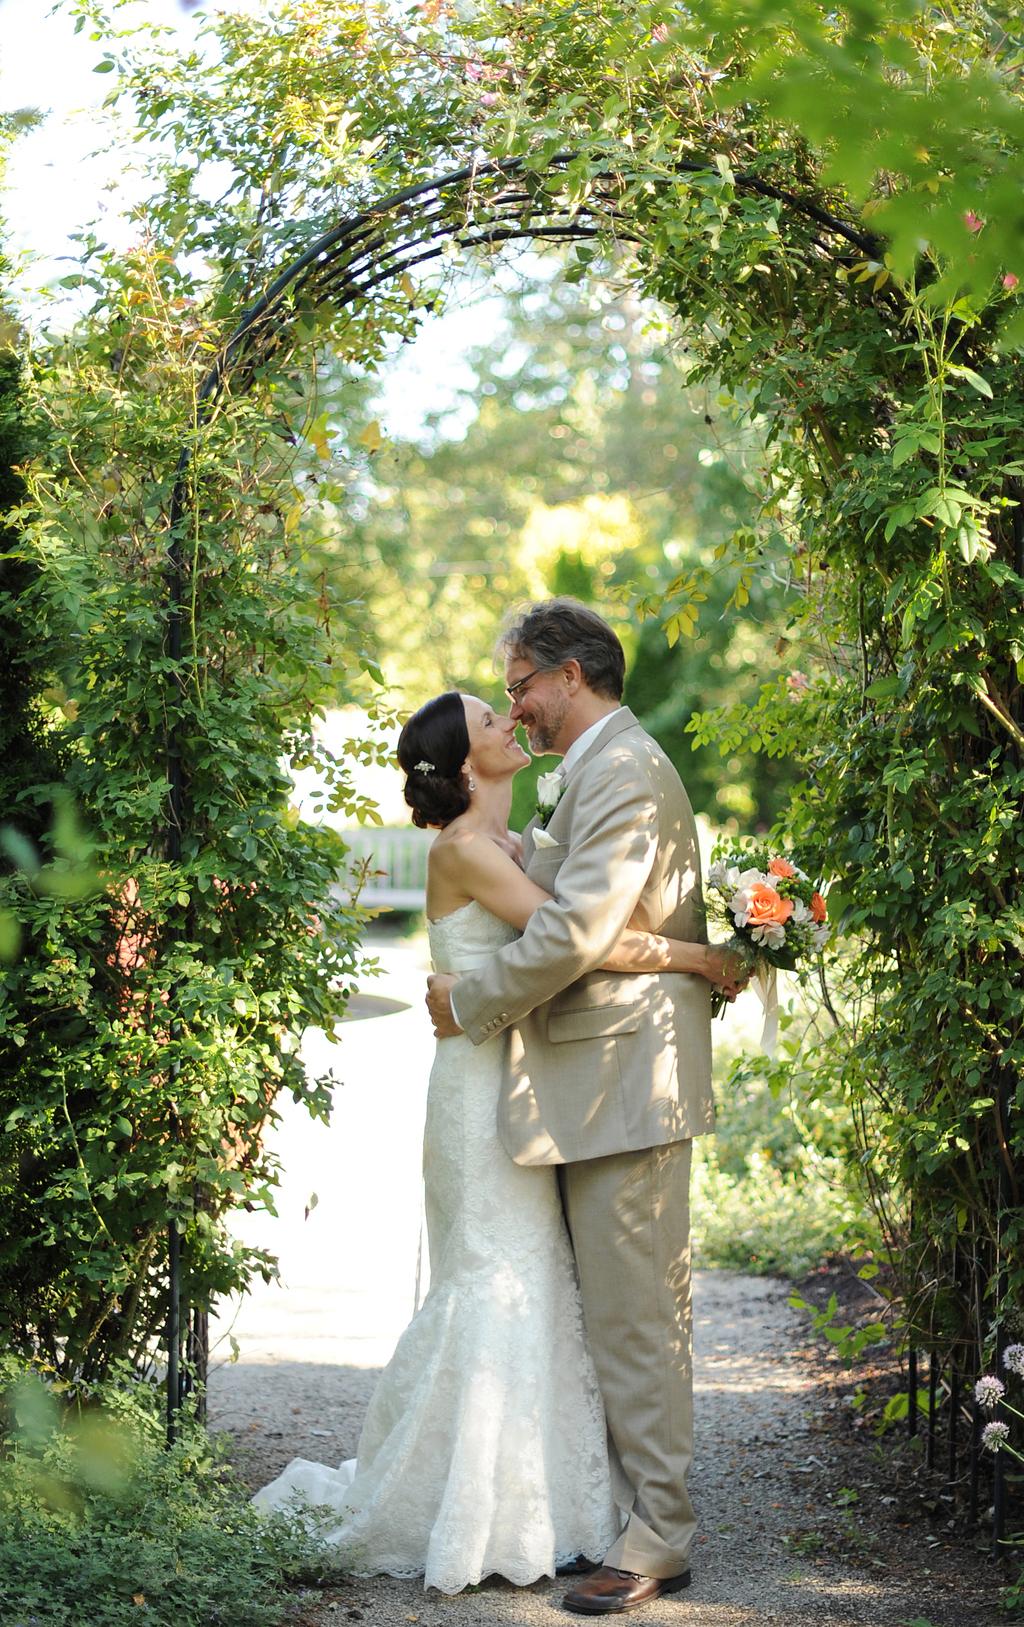 Sharon.andy_wedding_354.original.full